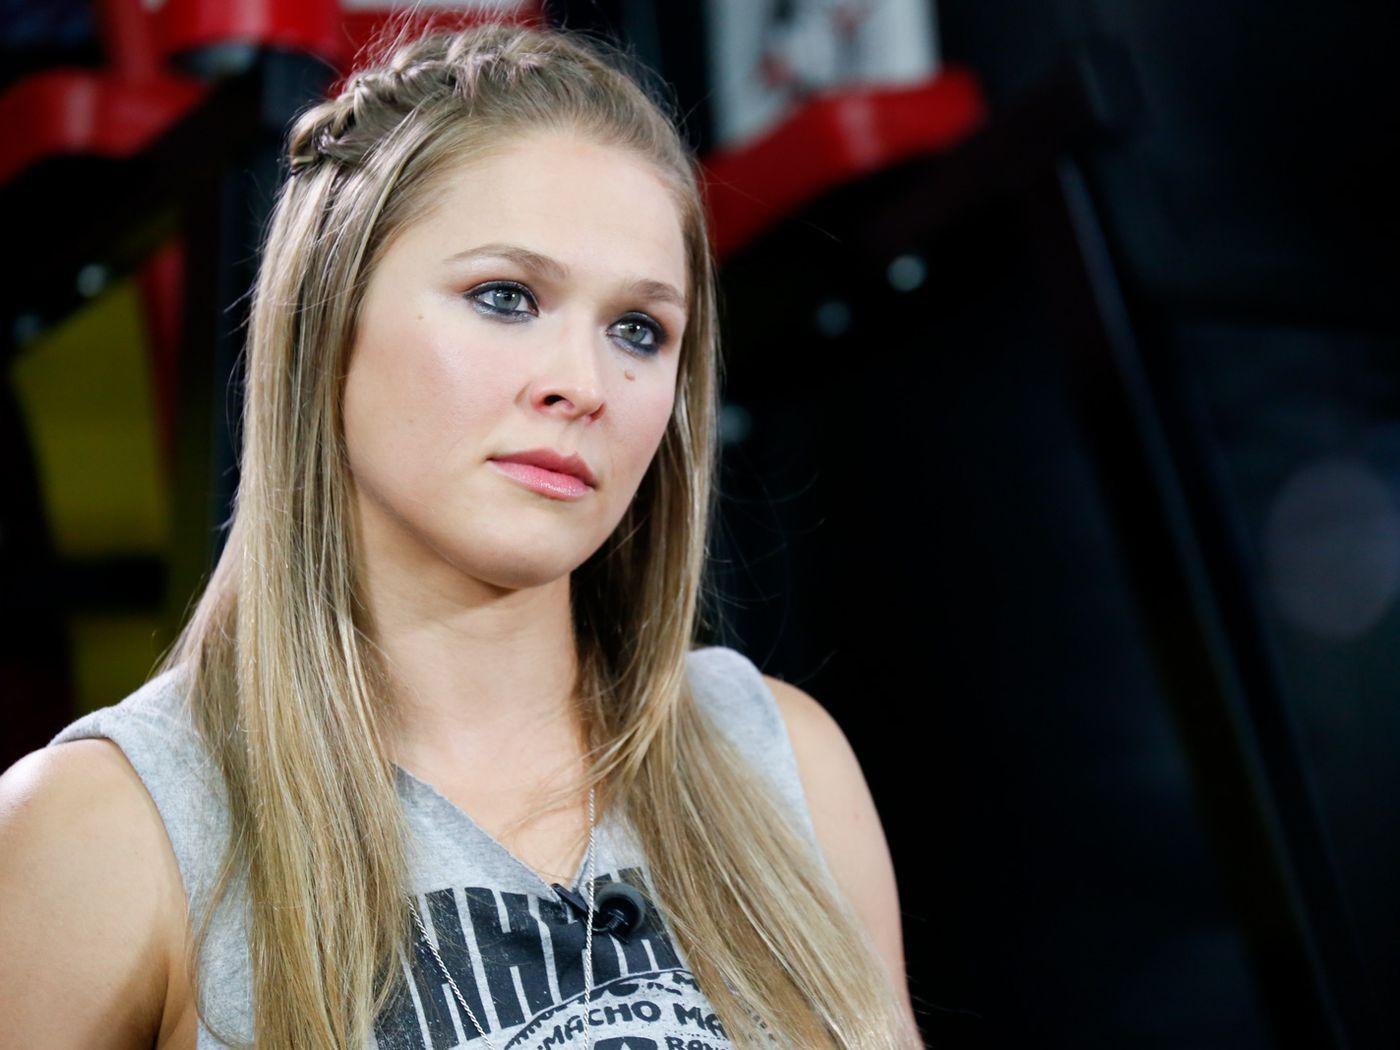 Ronda Rousey won't close door on UFC return despite WWE move - MMA Fighting